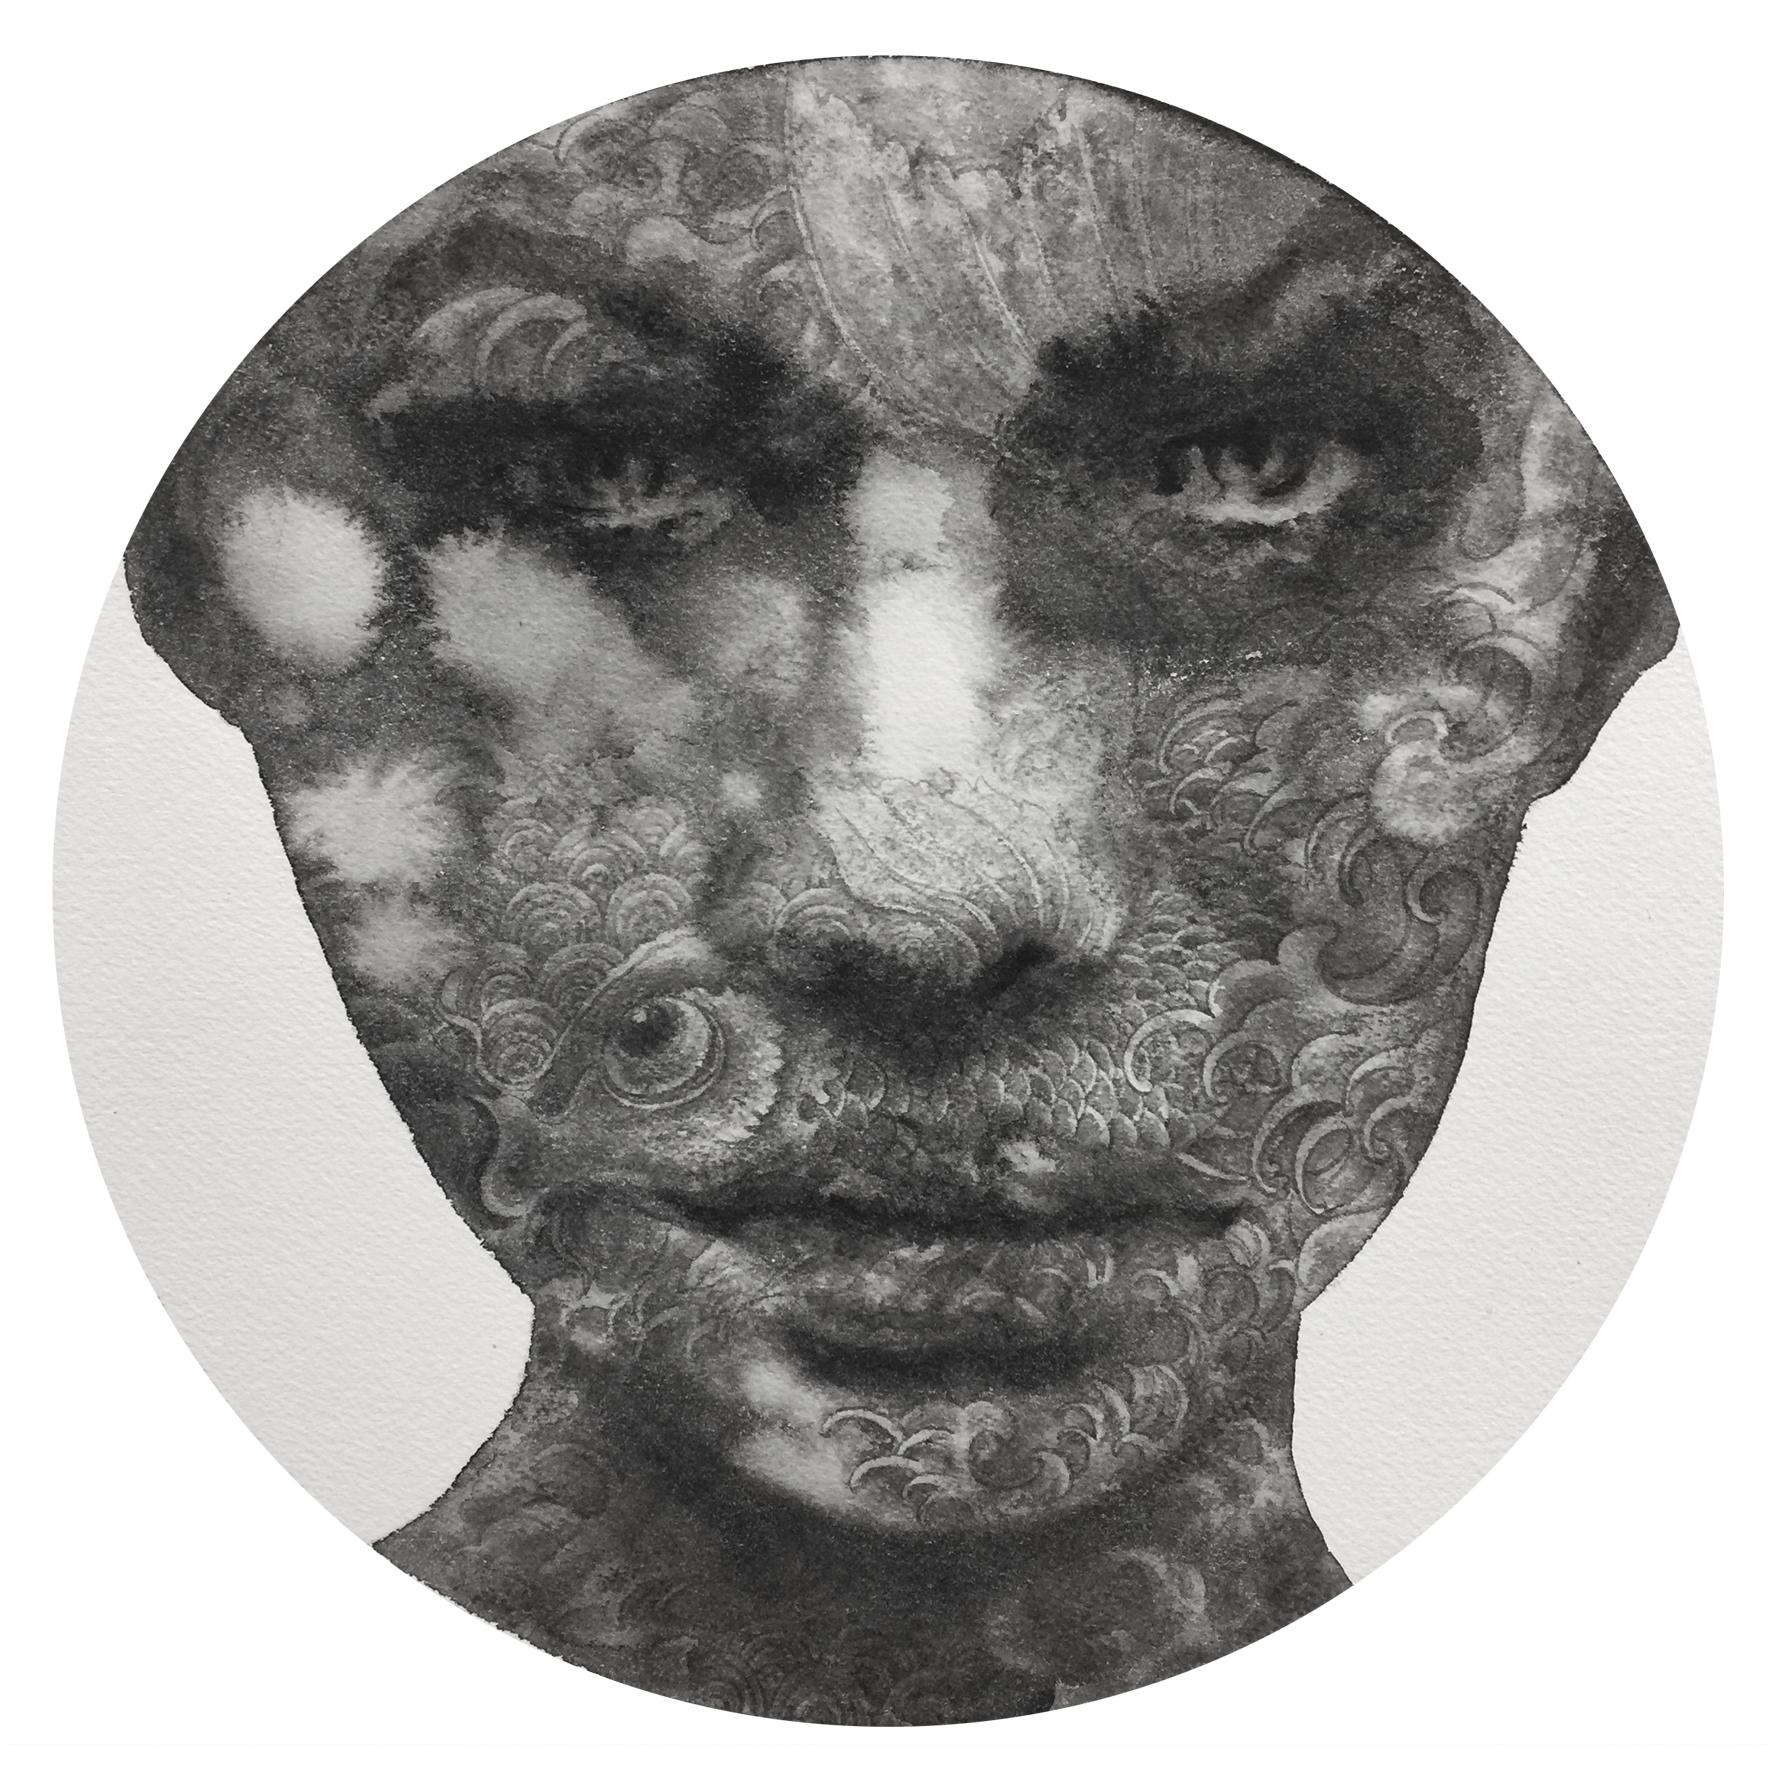 Reflection #9 (Contemporary Chinese Artist Shanlin Ye at Jim Kempner Fine Art)